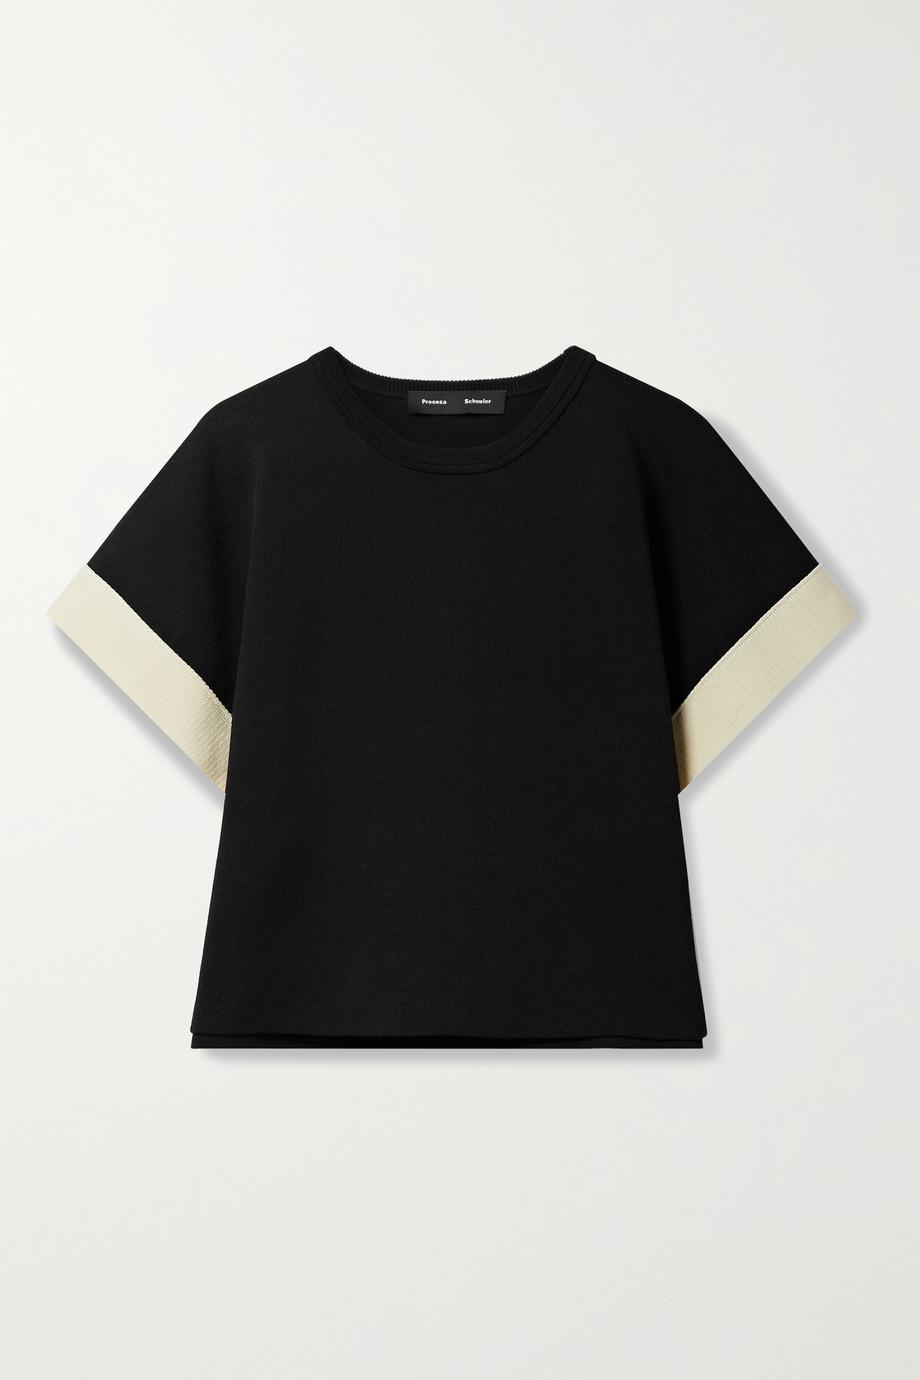 Proenza Schouler Button-detailed cotton-blend top